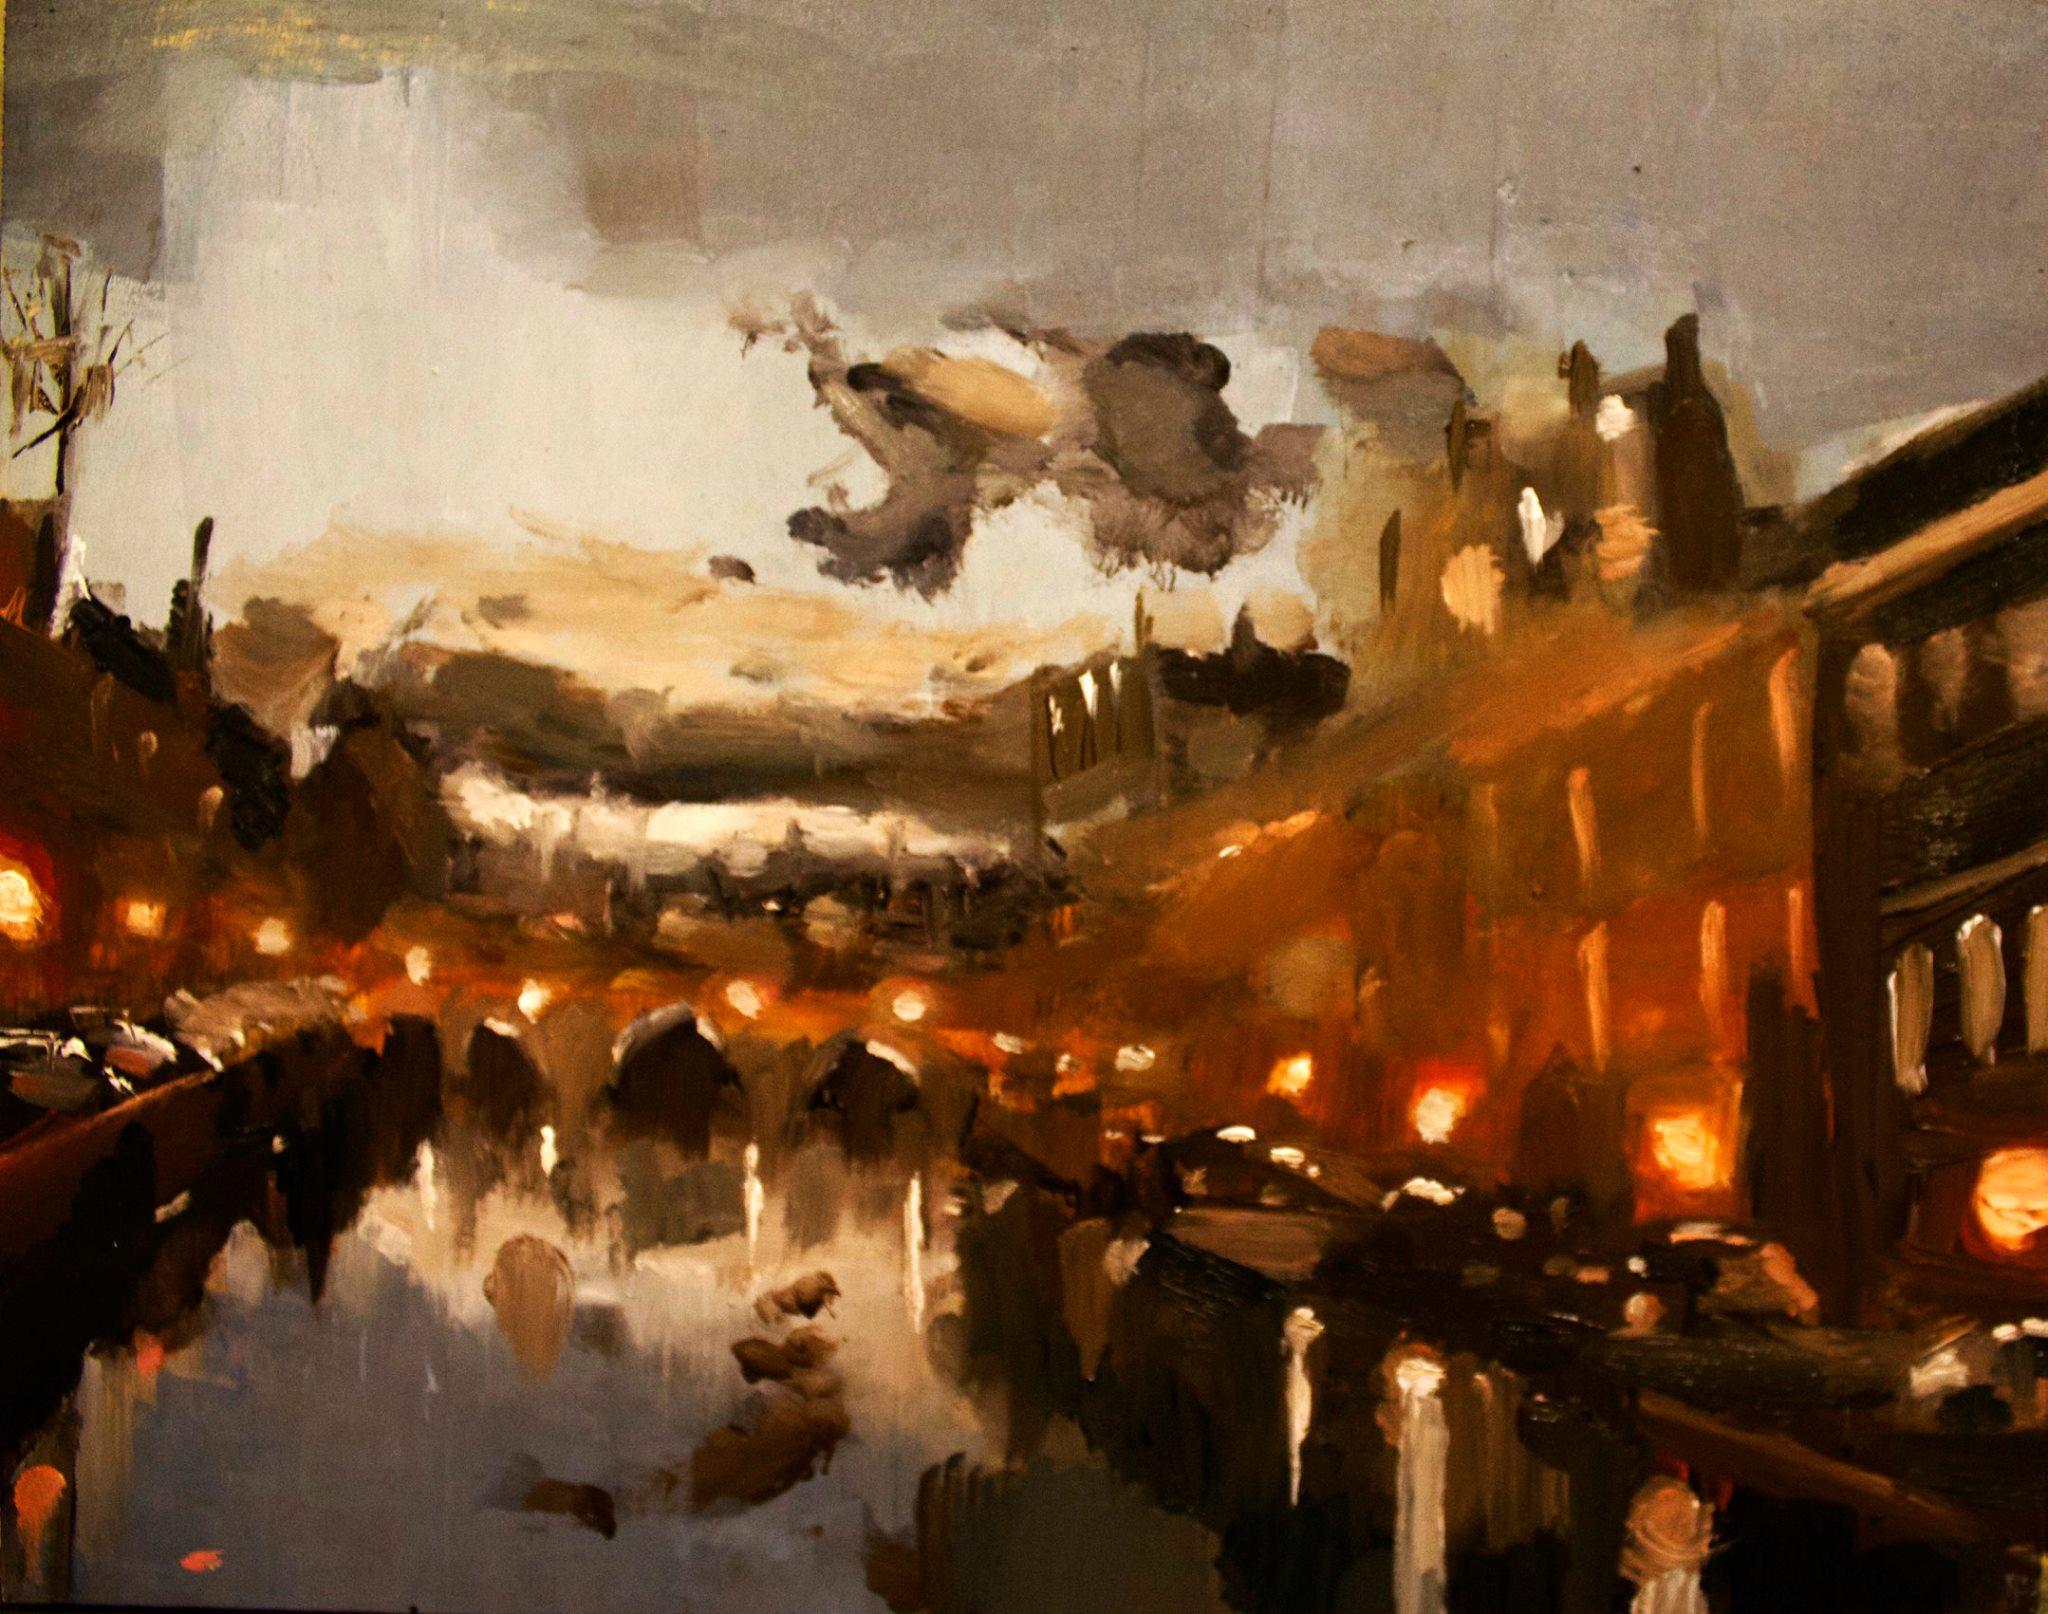 jose-alfonso-jd-alfonso-amsterdam-trip-orange-oil-painting.jpg